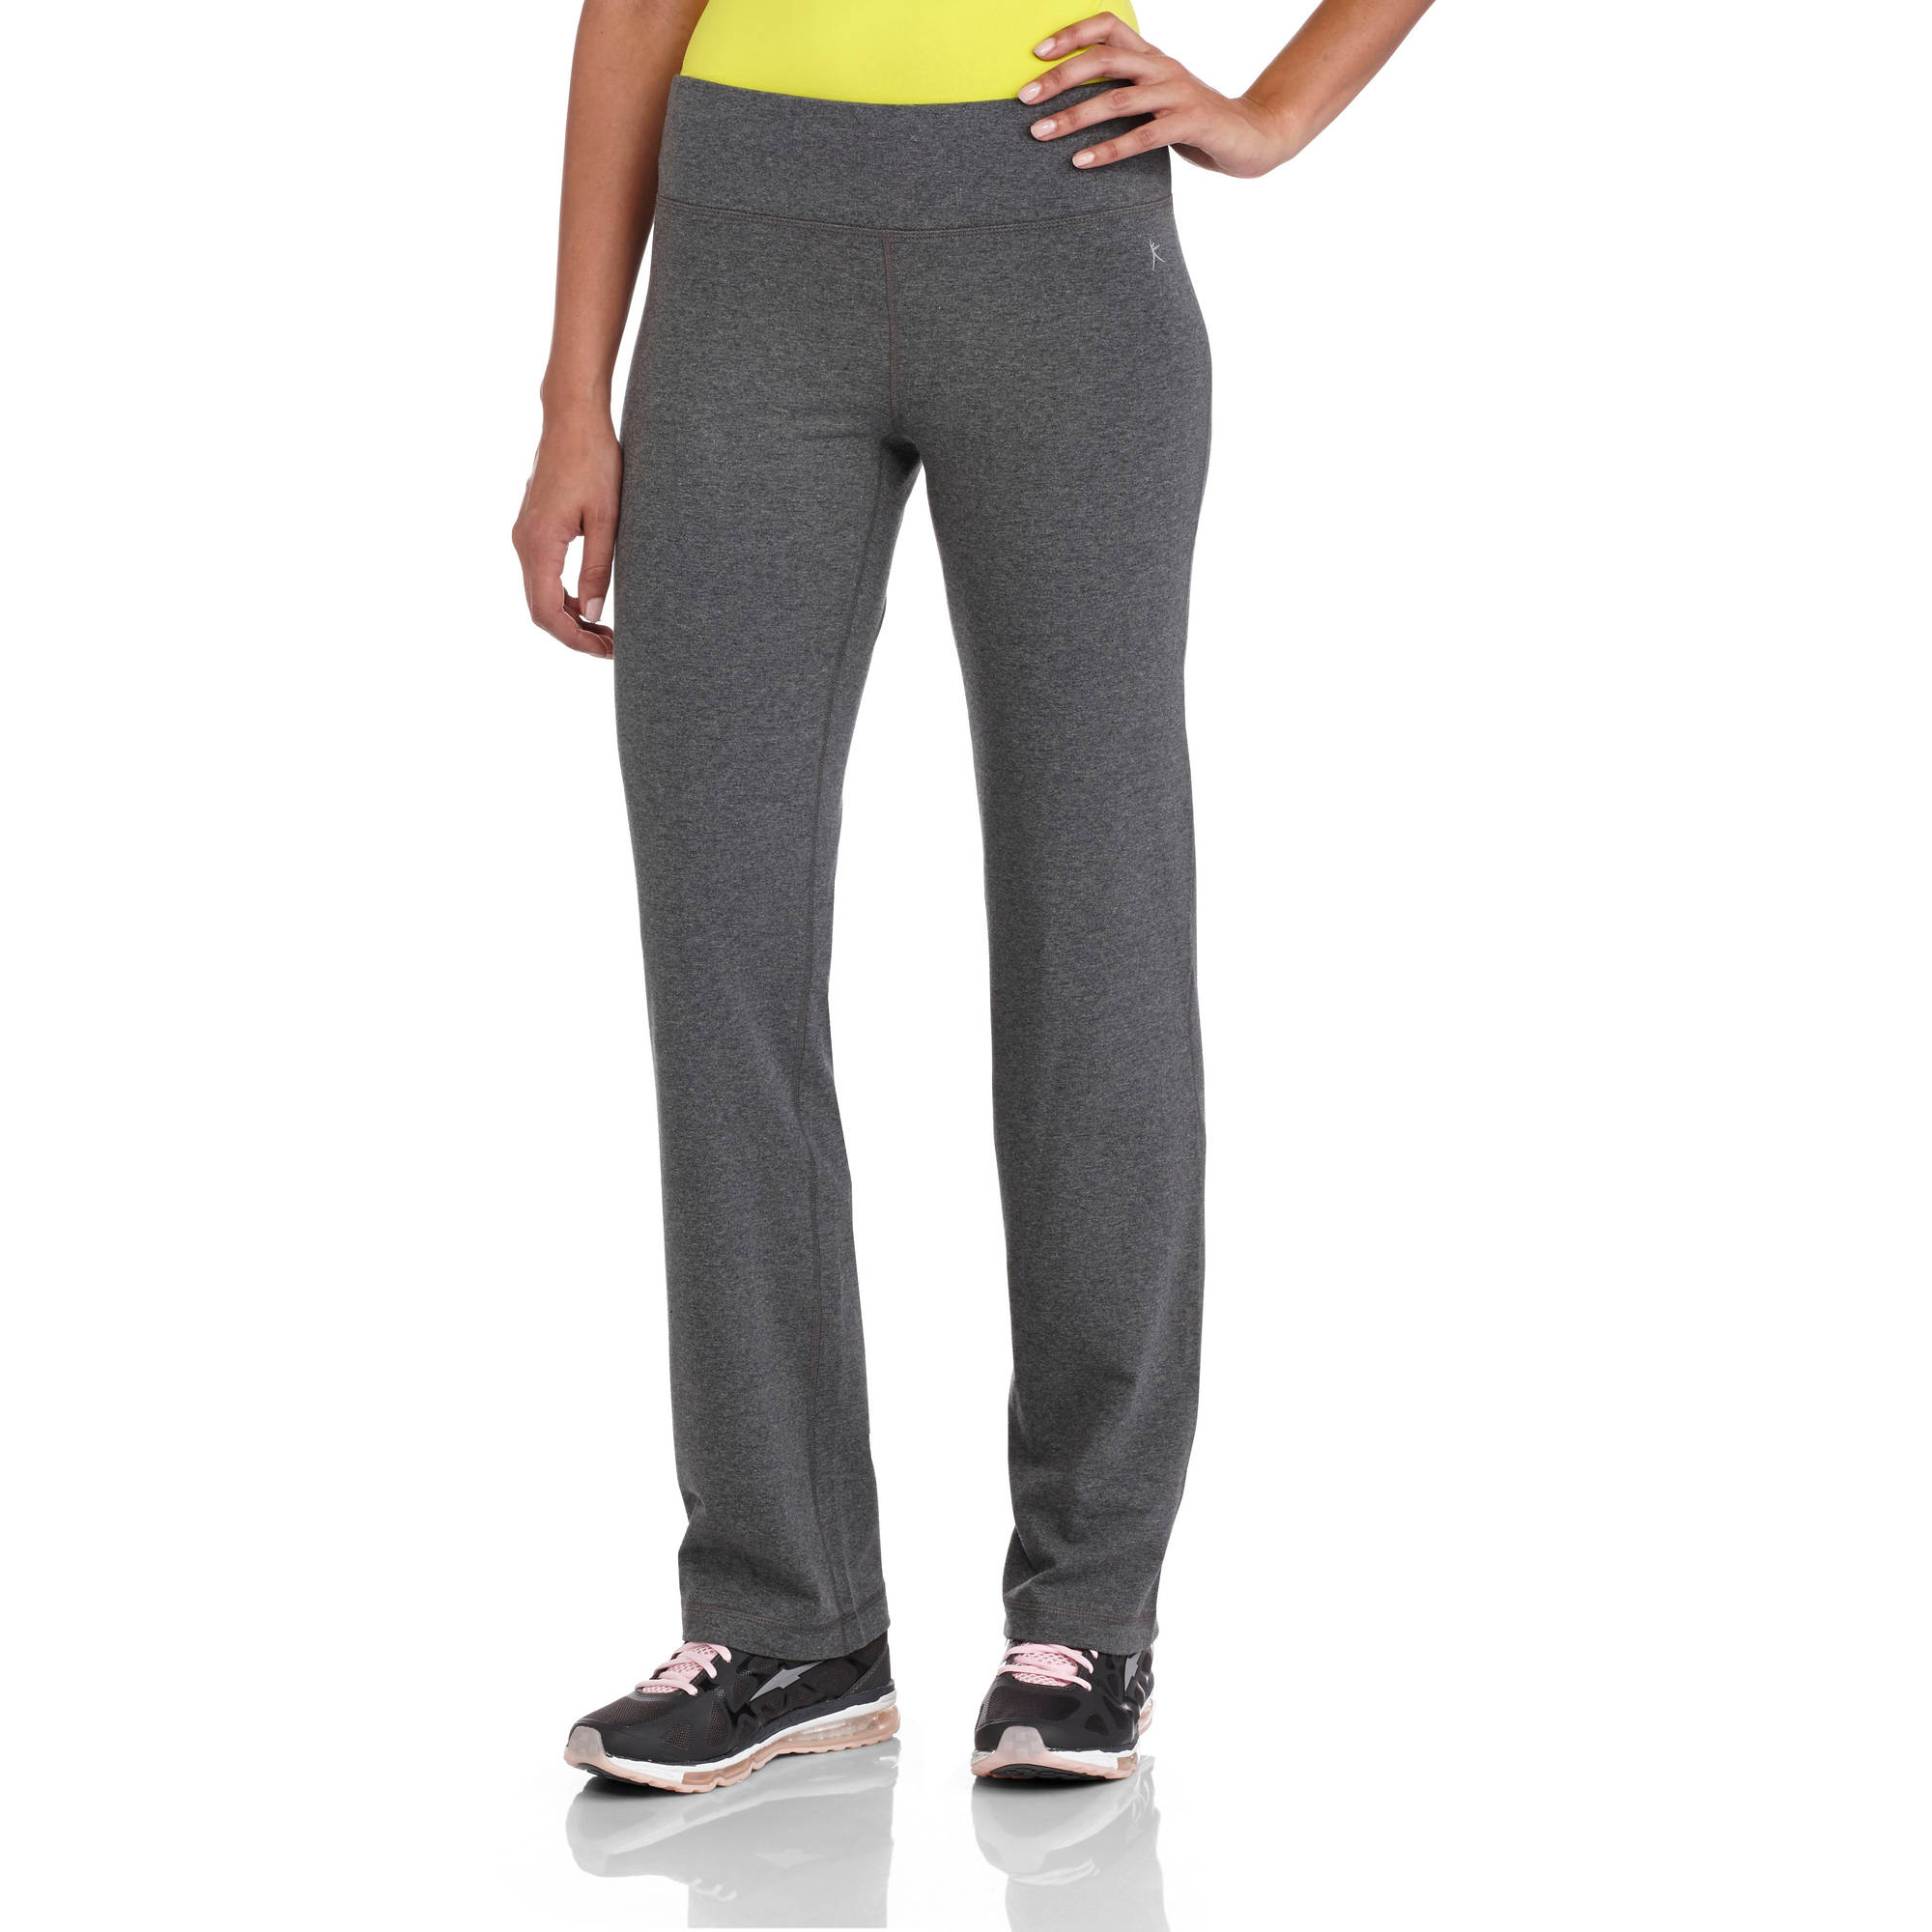 Danskin Now Women's Plus Size Dri More Straight Leg Pants